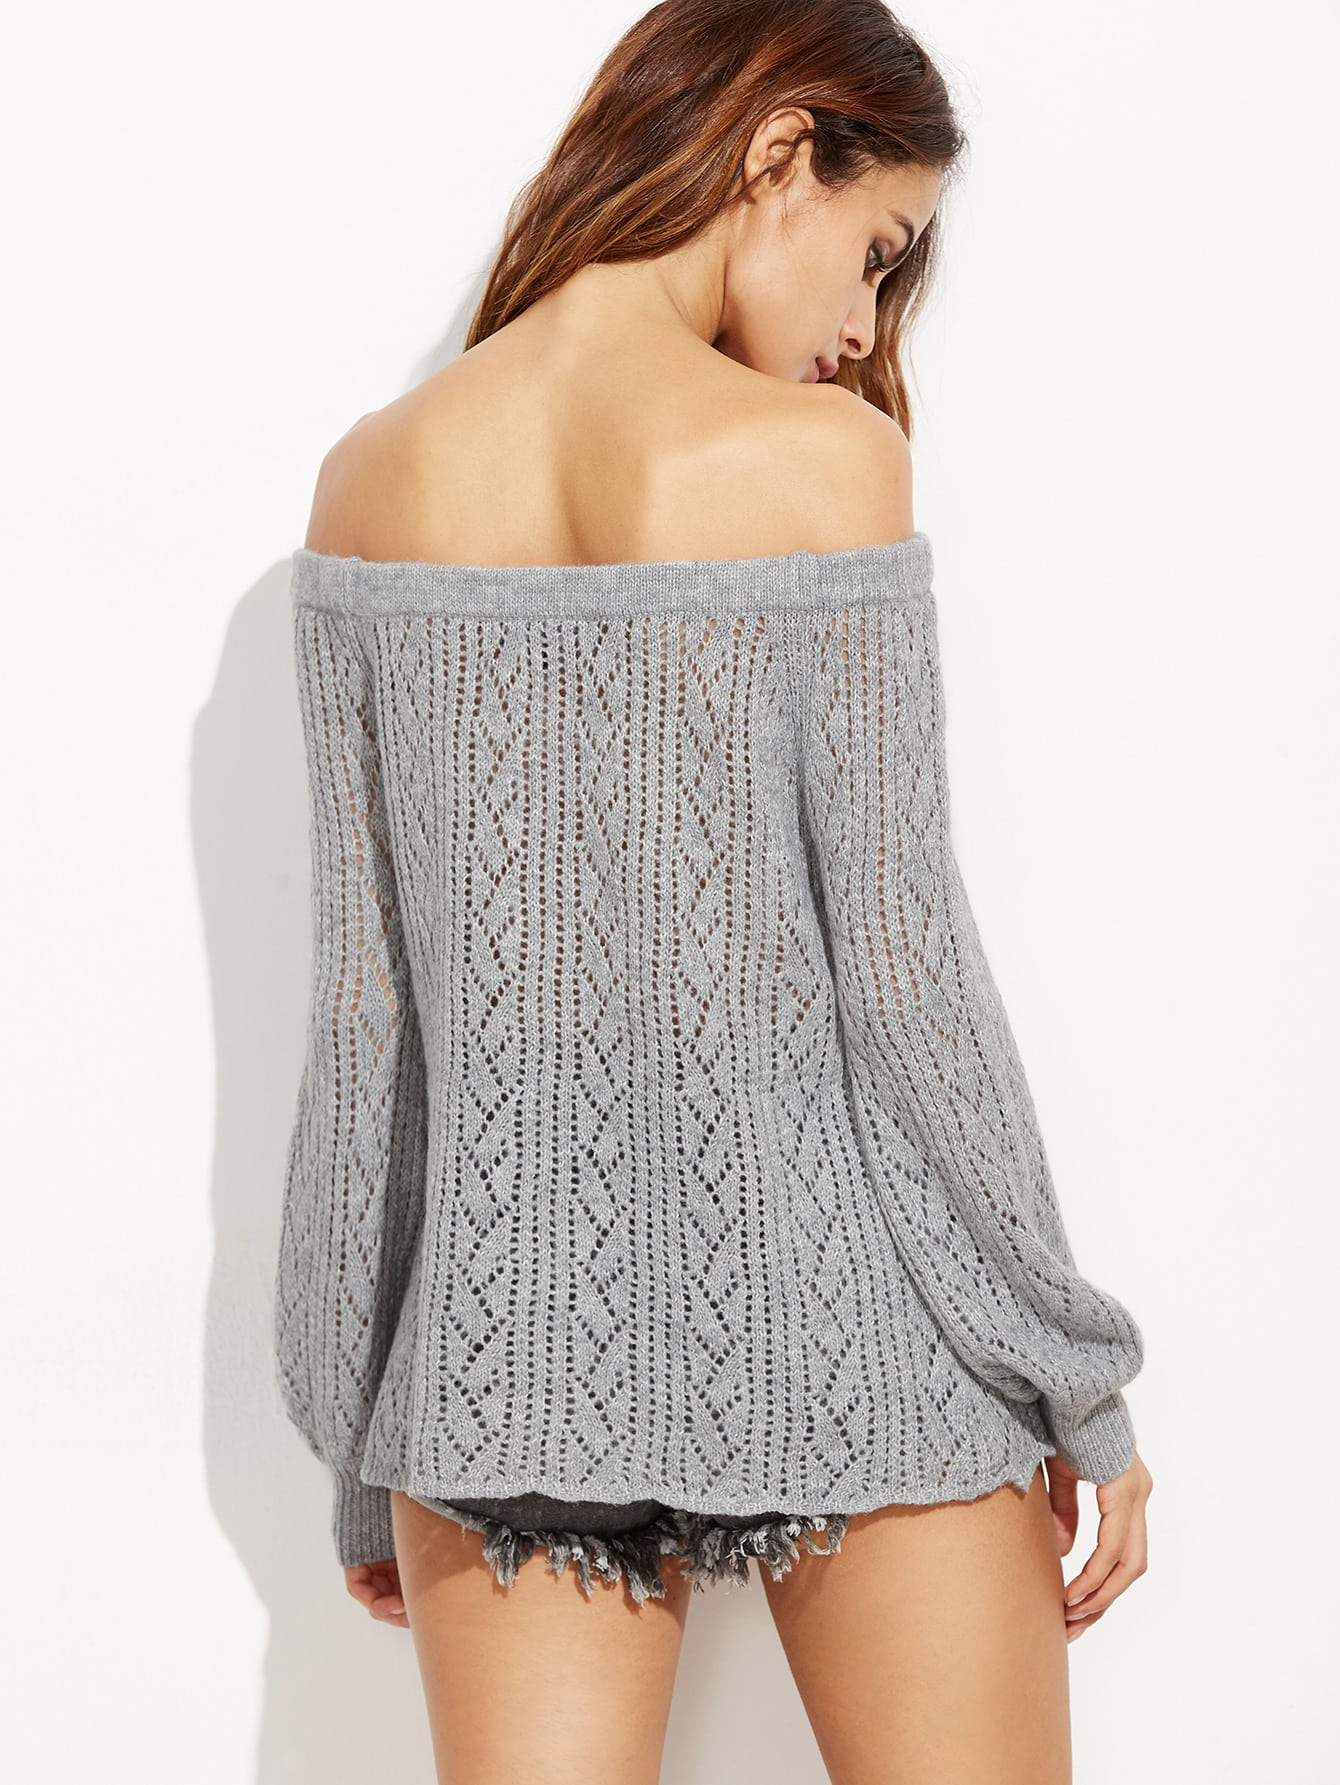 sweater160829457_2